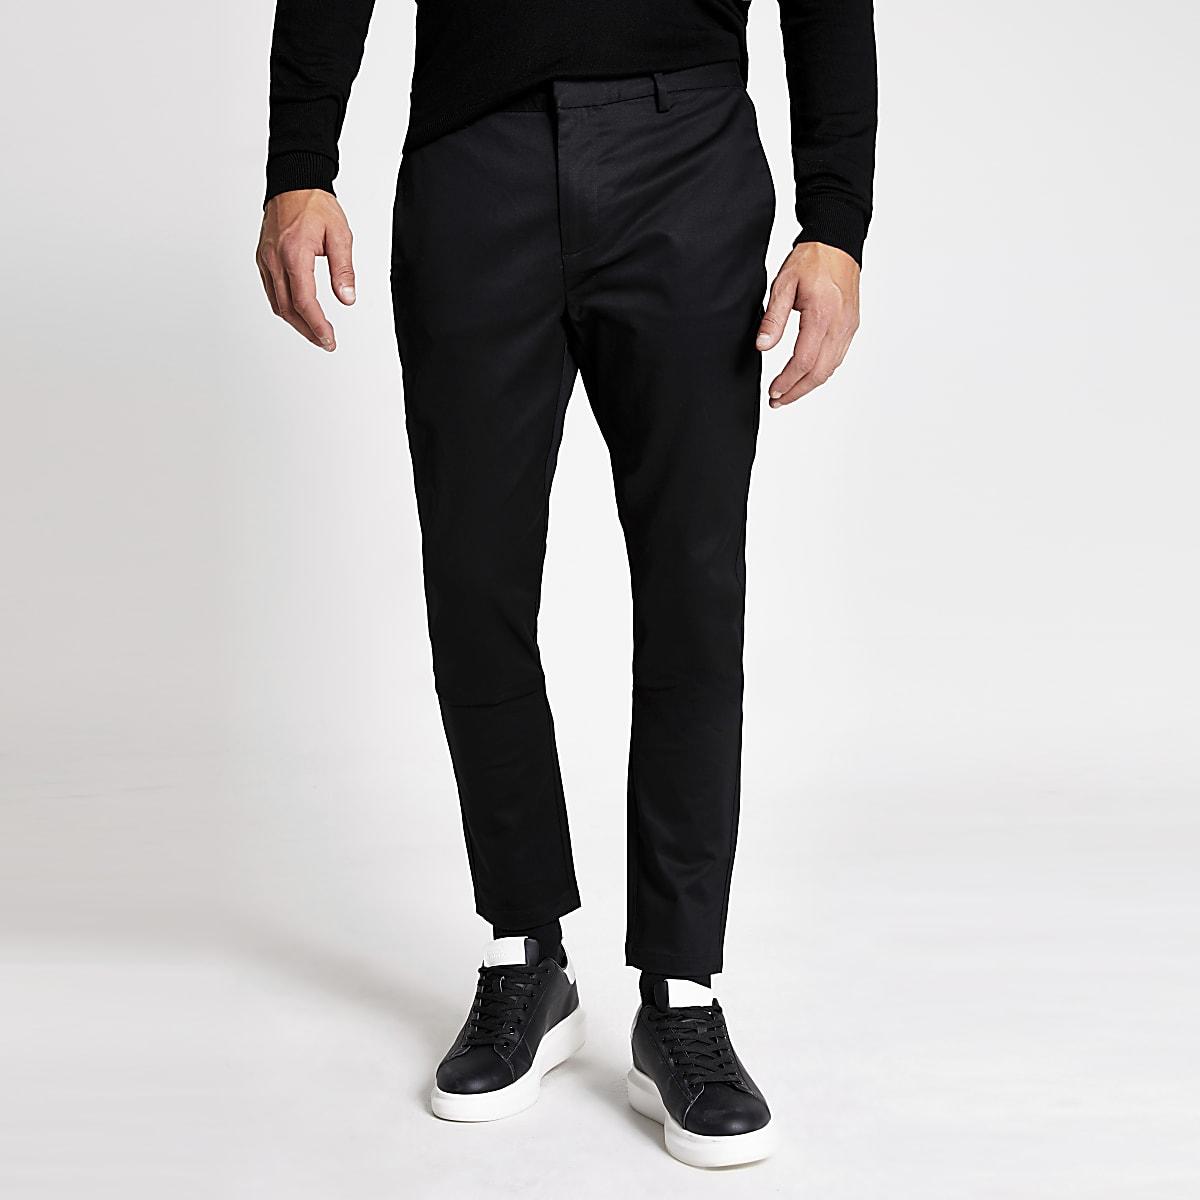 Pantalons chinohabillés skinny noirs